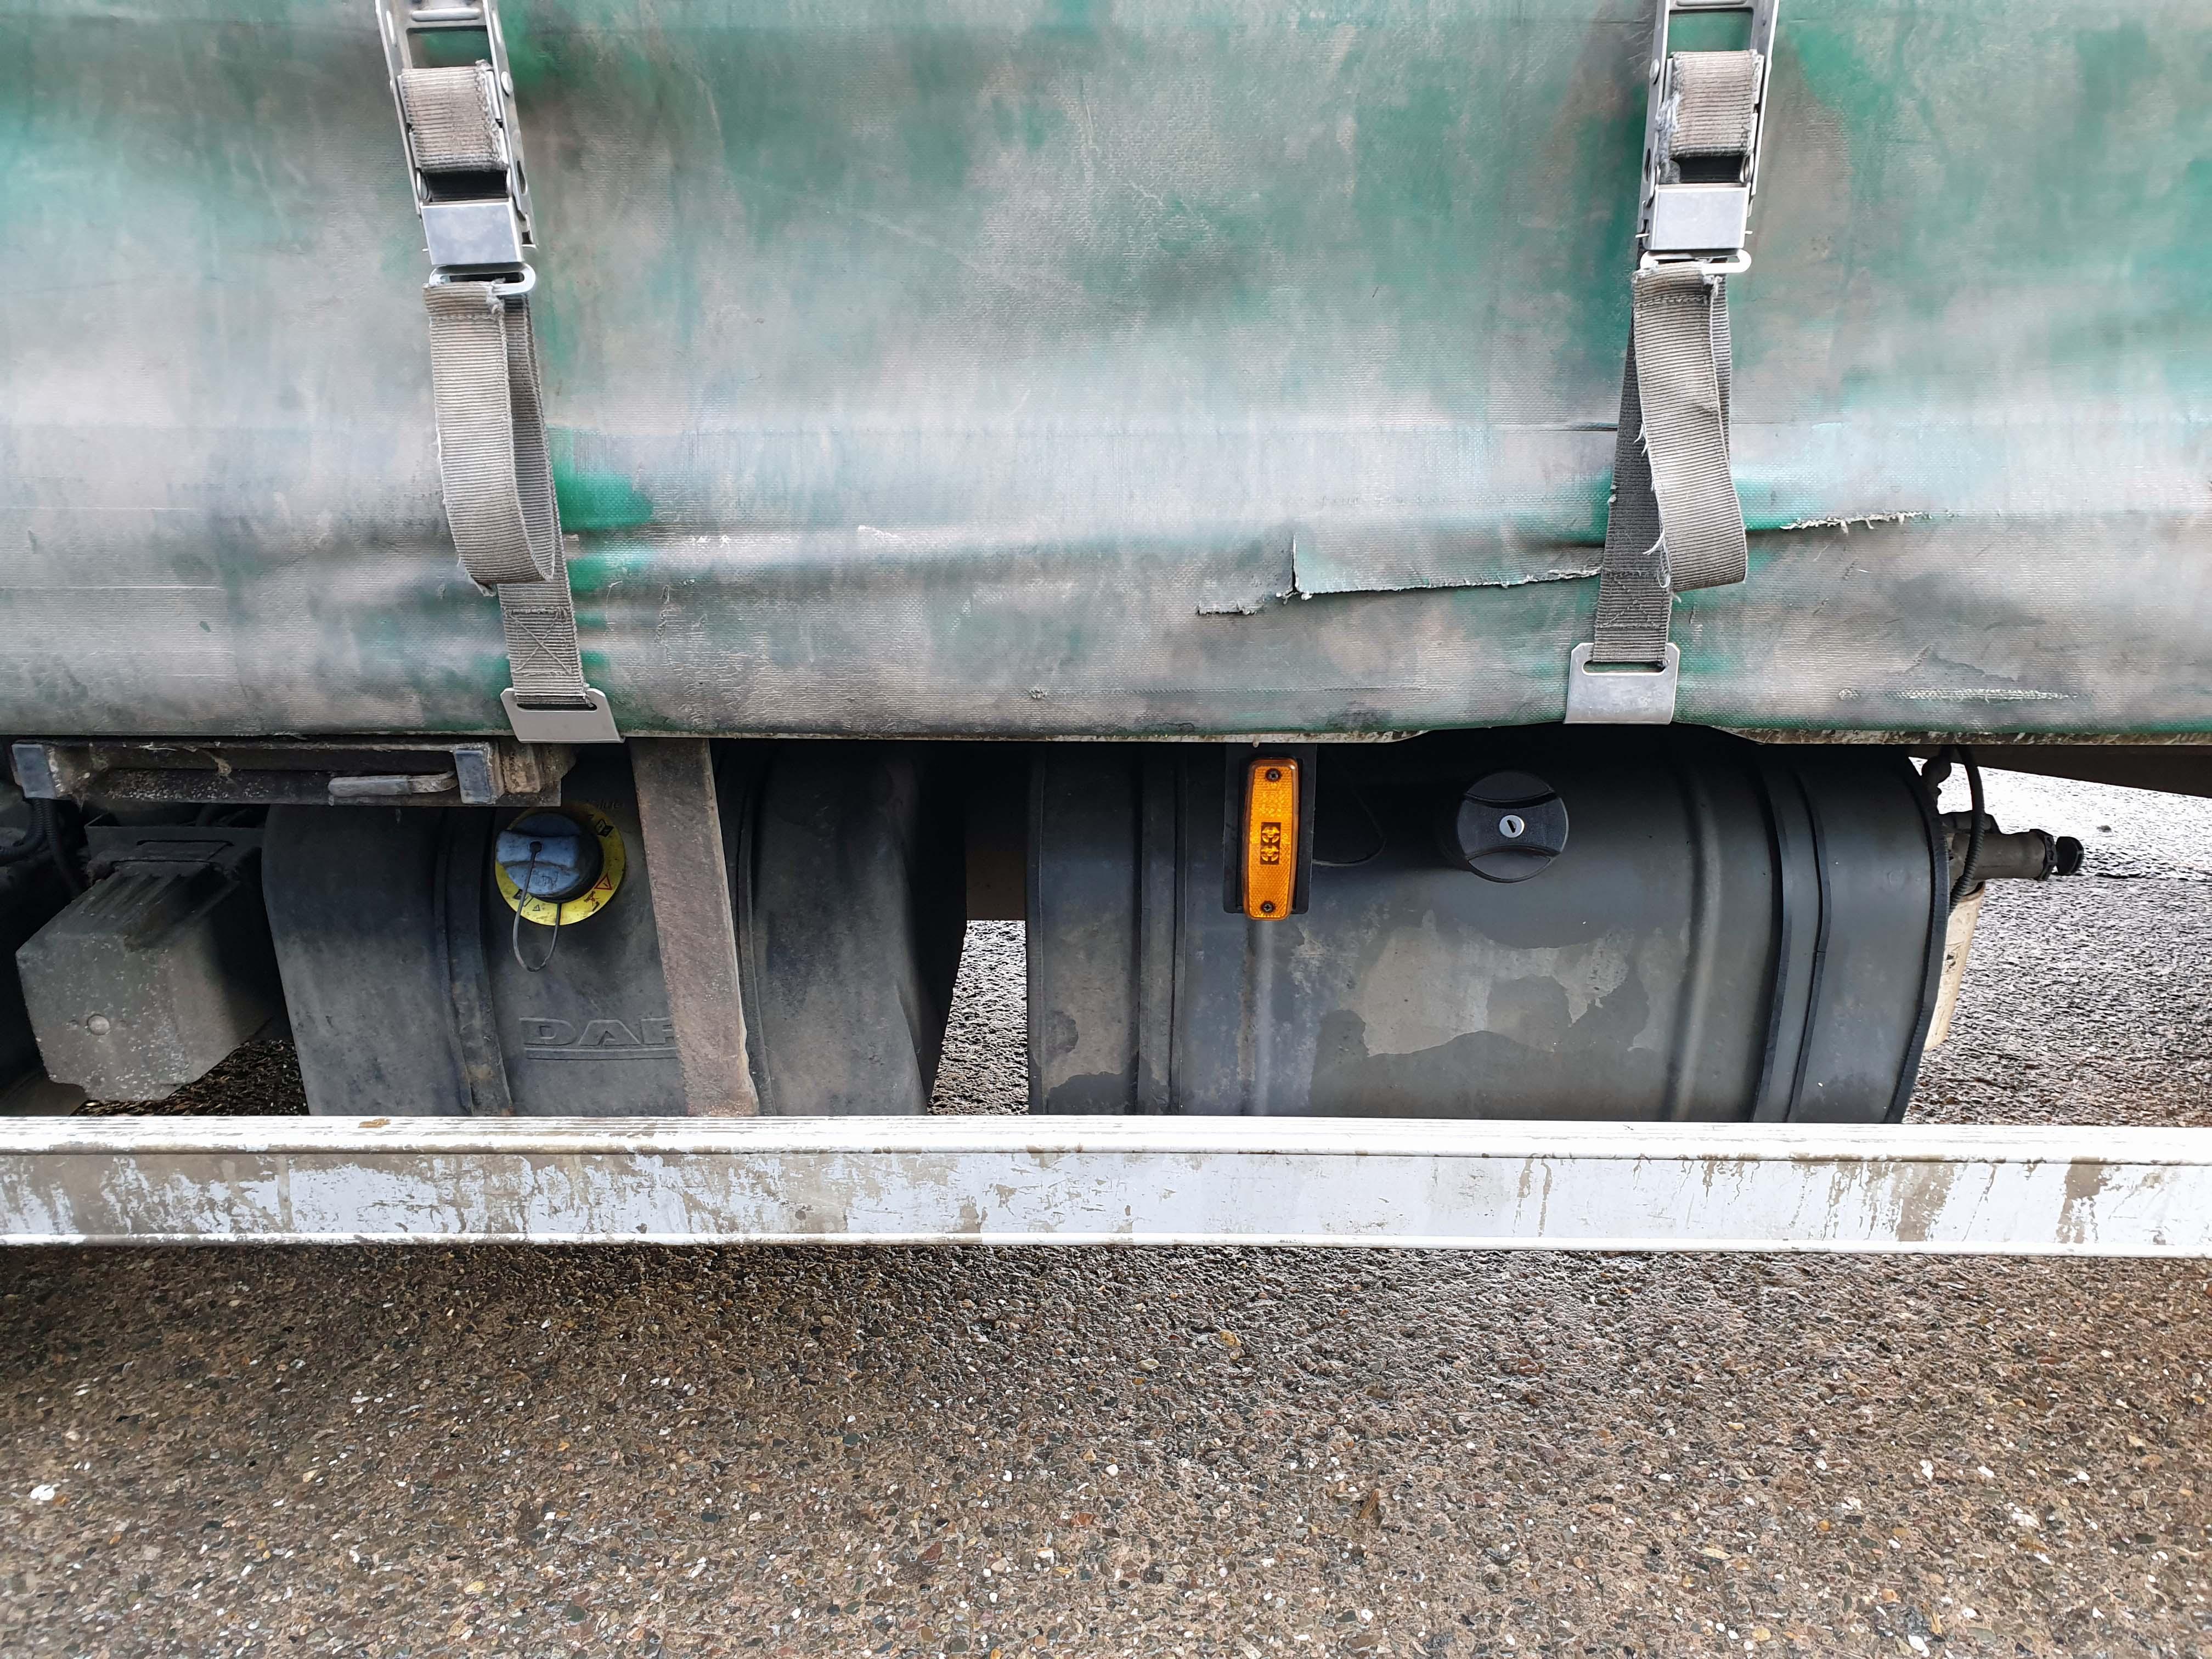 A DAF FA LF45.140 08 E 4461CC Euro4 4x2 7.5-Tonne Curtainside Truck, Registration No. RV59 FVA, - Image 9 of 11